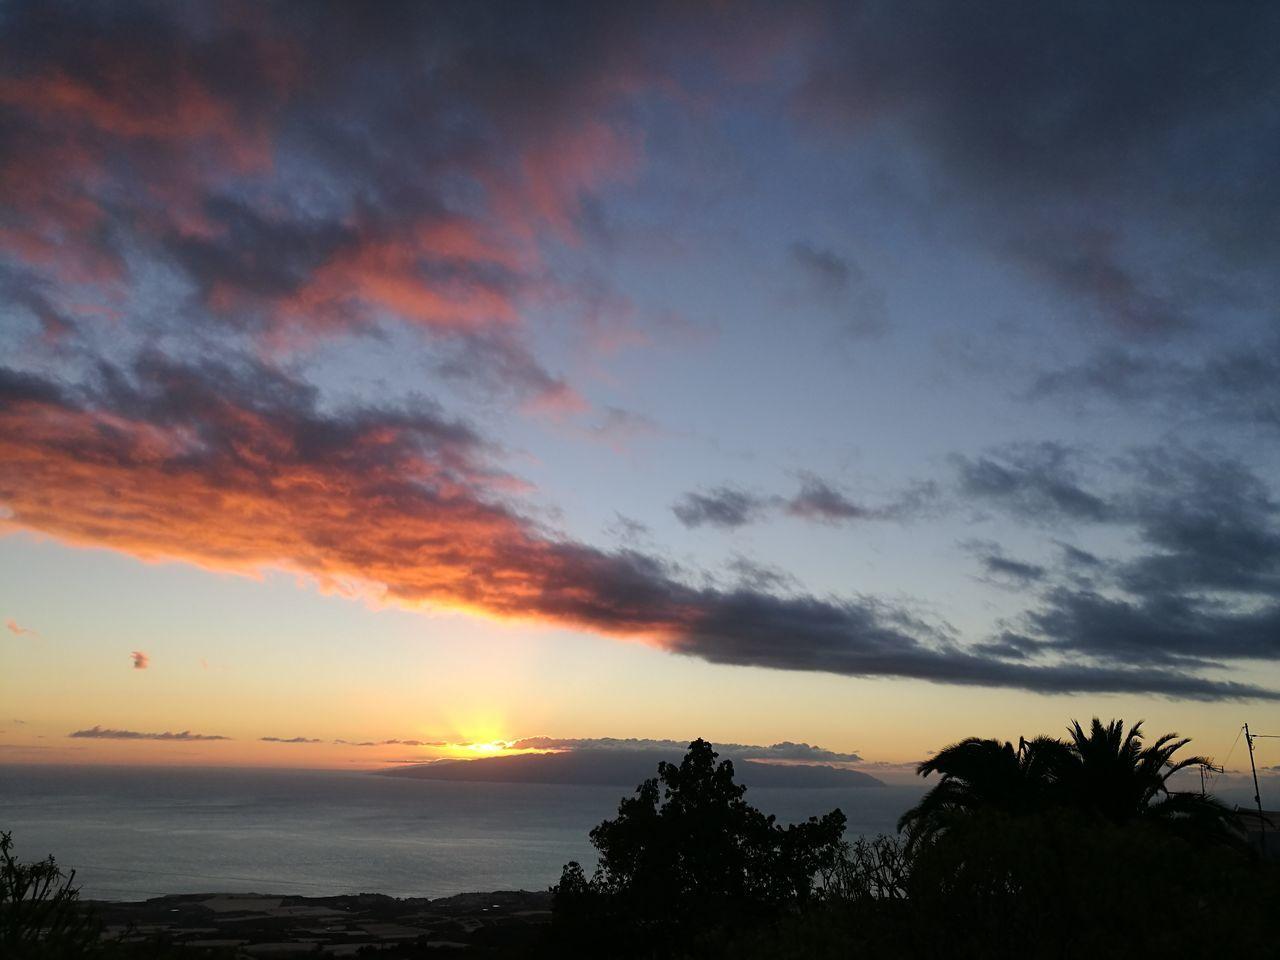 La Gomera, Canary Islands Tenerife Island Sunset Dramatic Sky Beauty Nature Beauty In Nature Natural Beauty Naturaleza🌾🌿 Atardecer Guia De Isora Huawei P9. Tenerife Sur Photo♡ HuaweiP9 Orange Color La Gomera Sin Filtros Day Mountain View